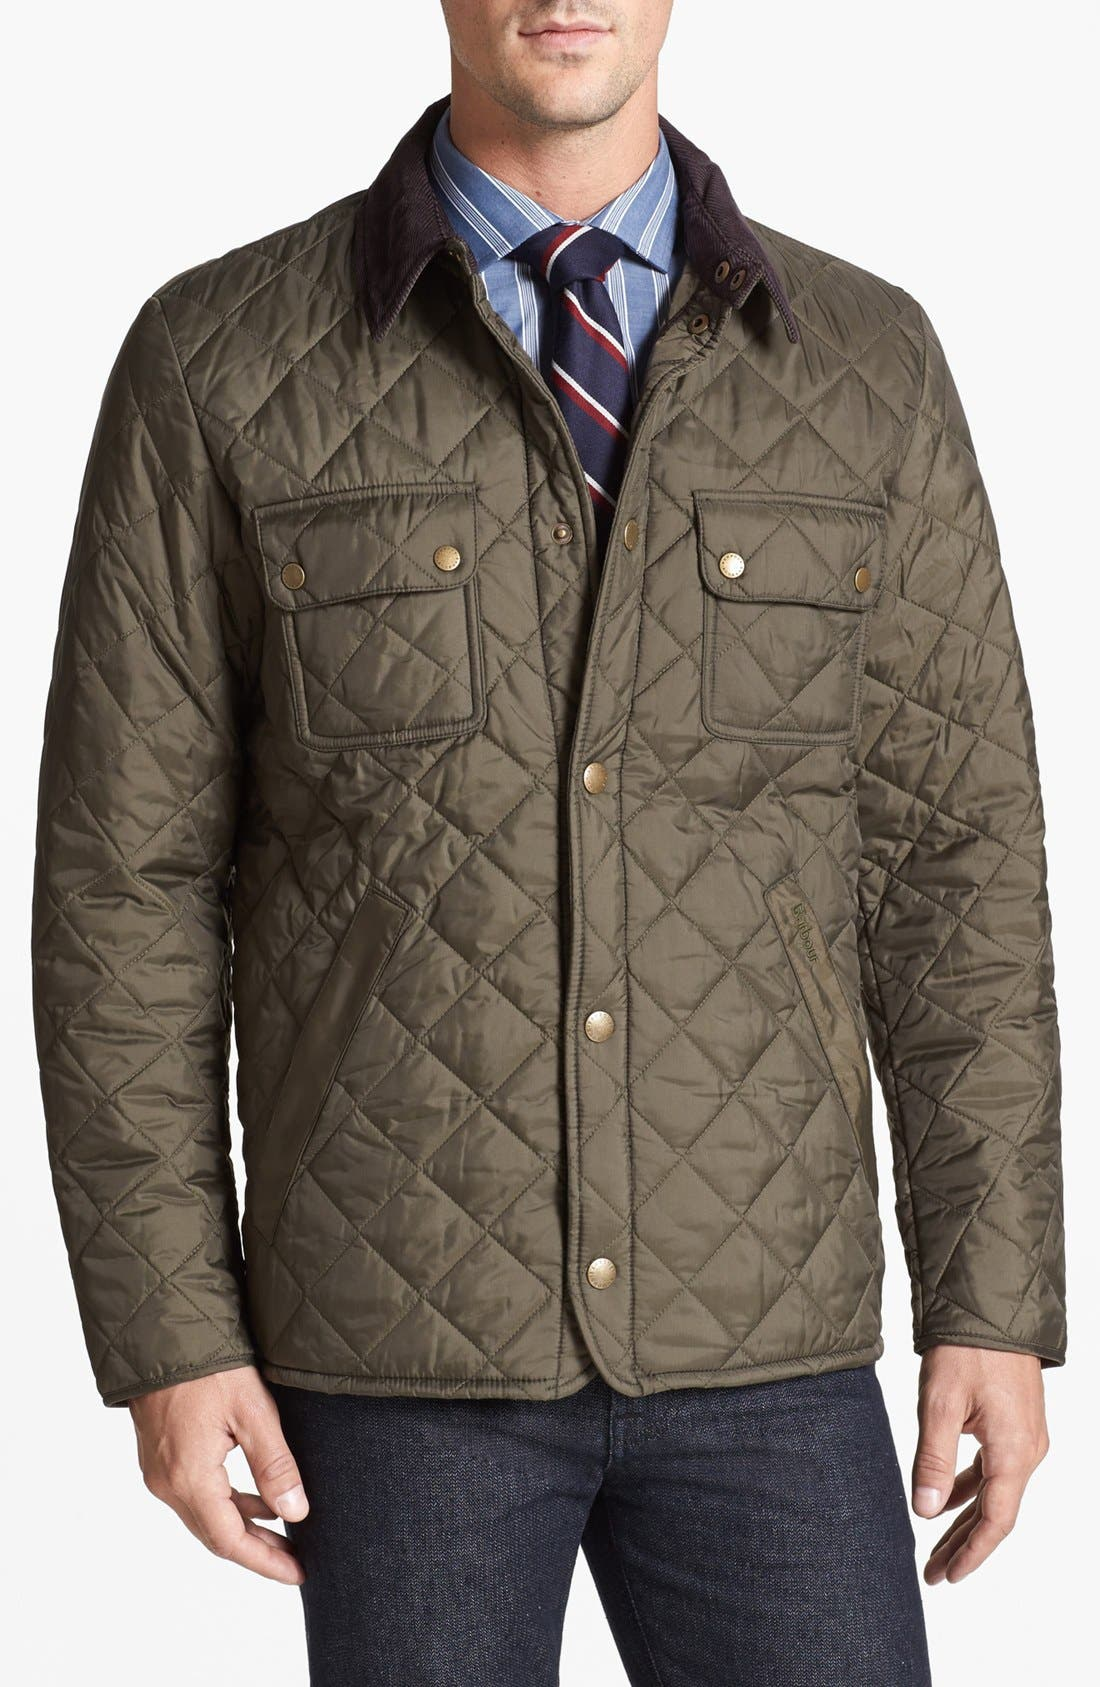 Alternate Image 1 Selected - Barbour 'Tinford' Regular Fit Quilted Jacket